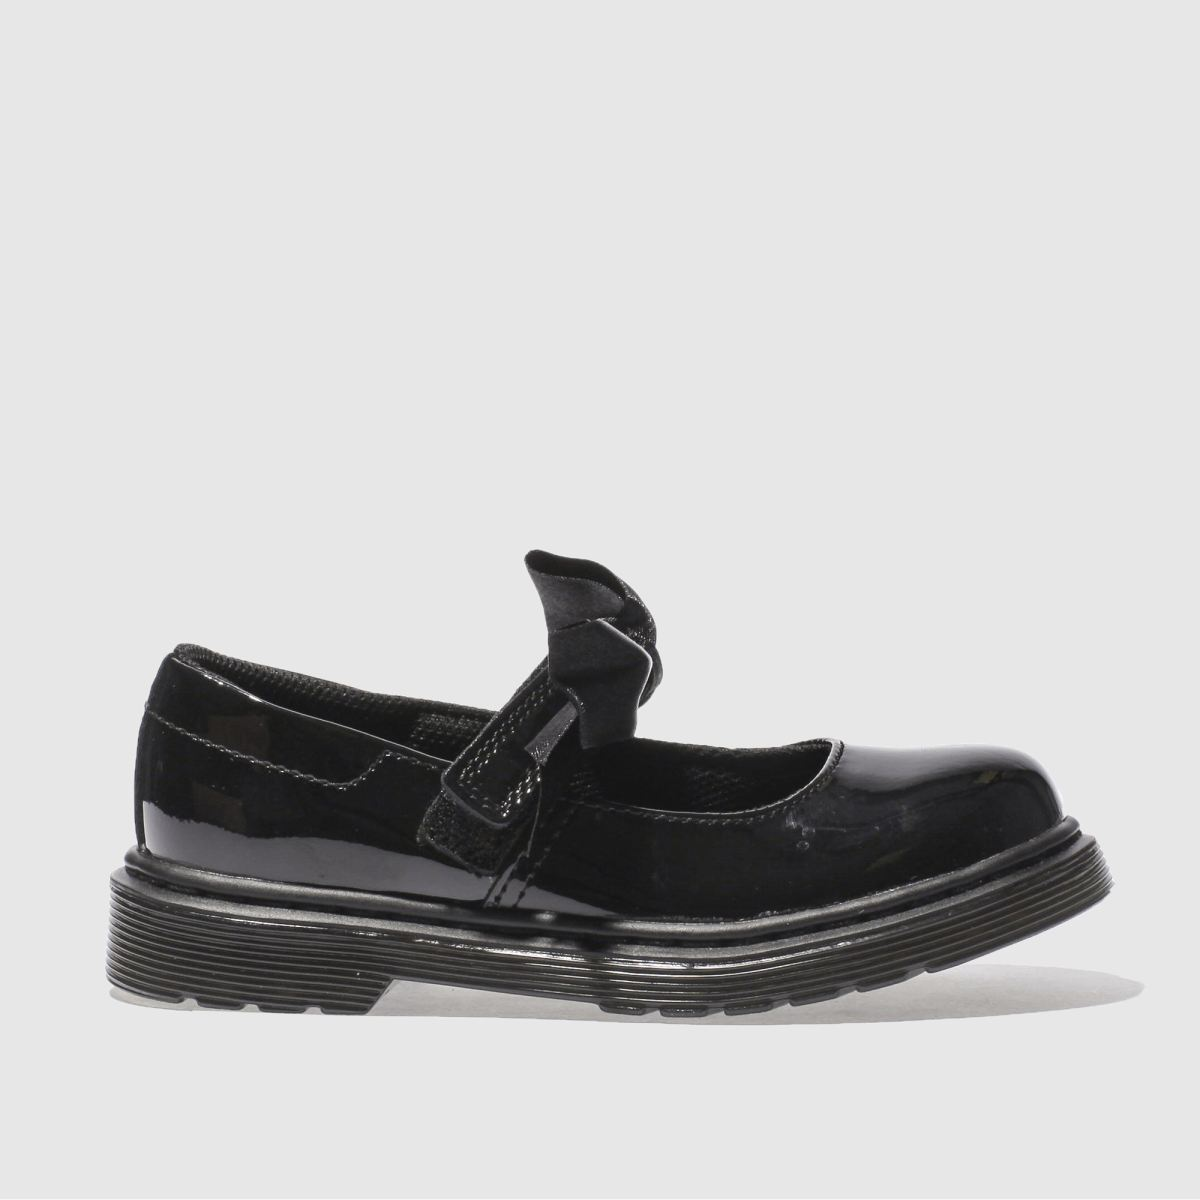 dr martens black maccy Girls Junior Shoes